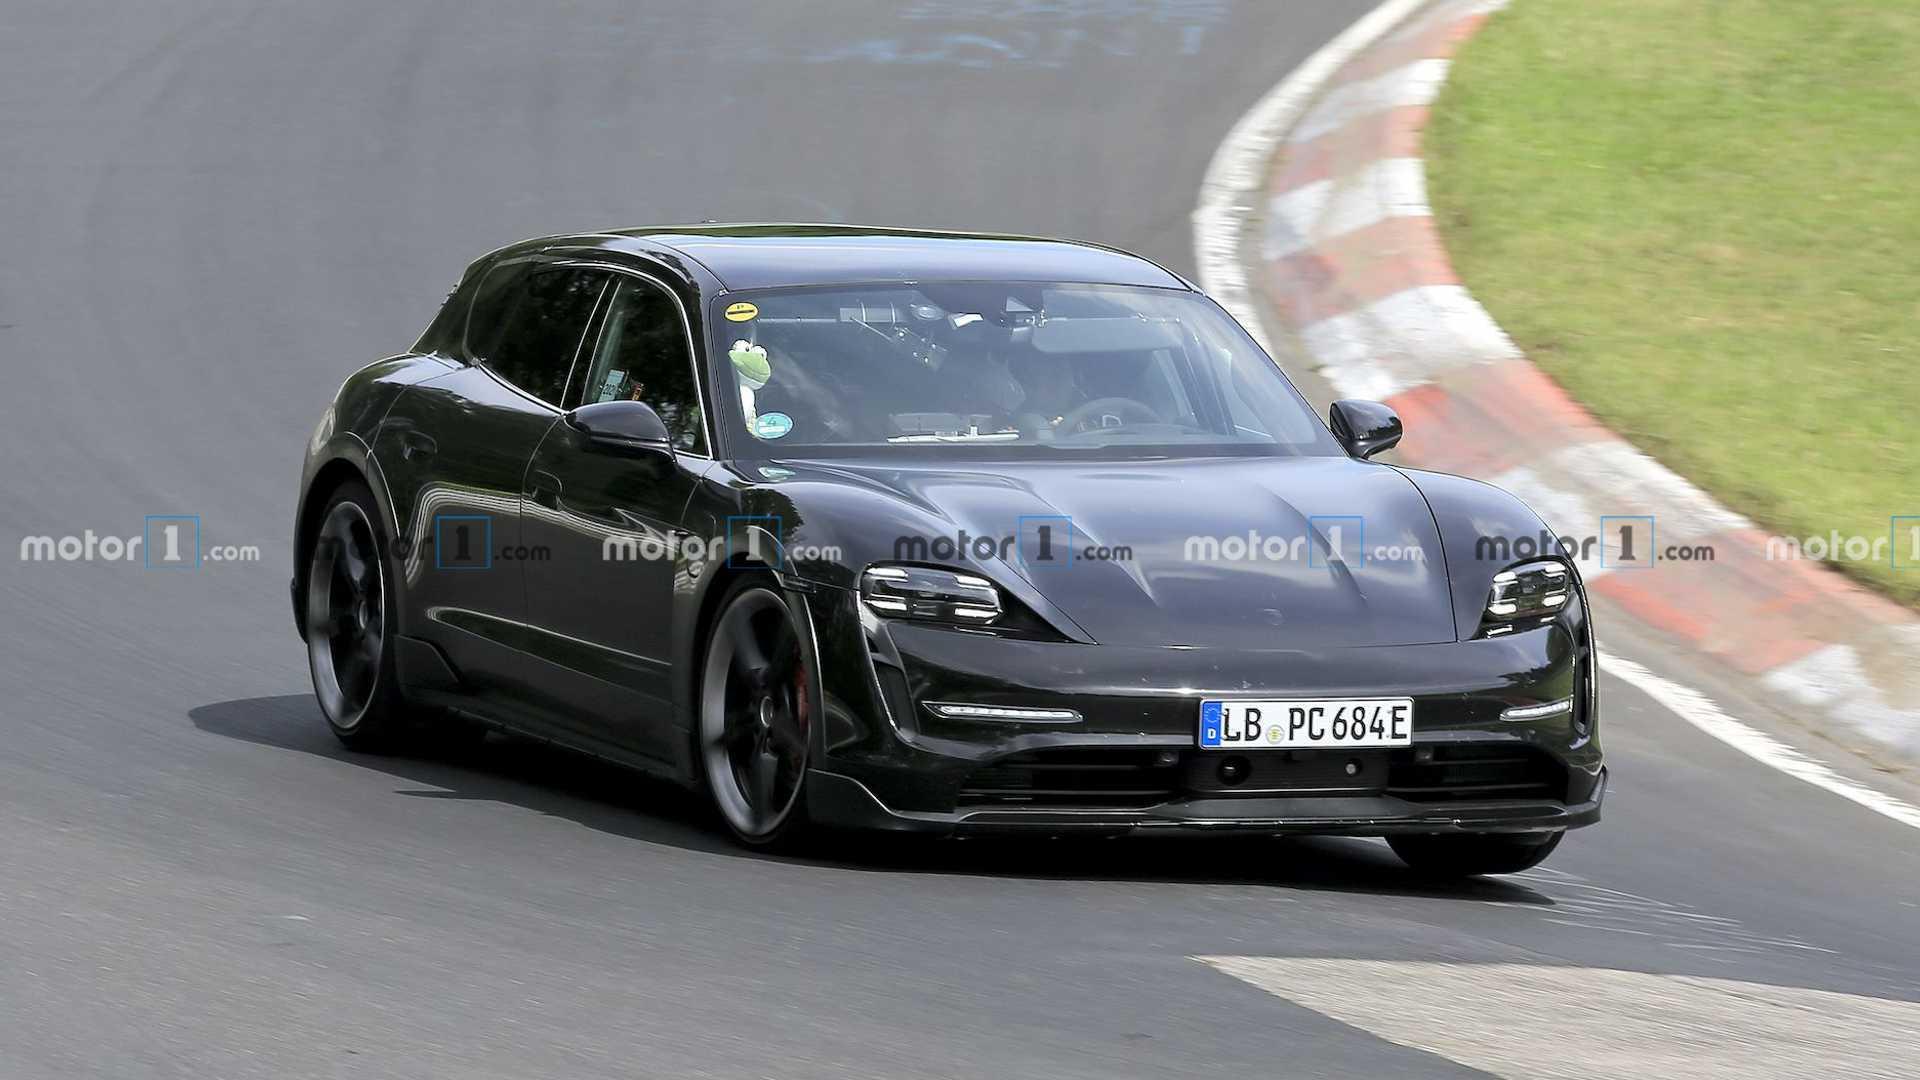 2020 - [Porsche] Taycan Sport Turismo - Page 2 Porsche-taycan-cross-turismo-spied-at-nurburgring-front-quarter